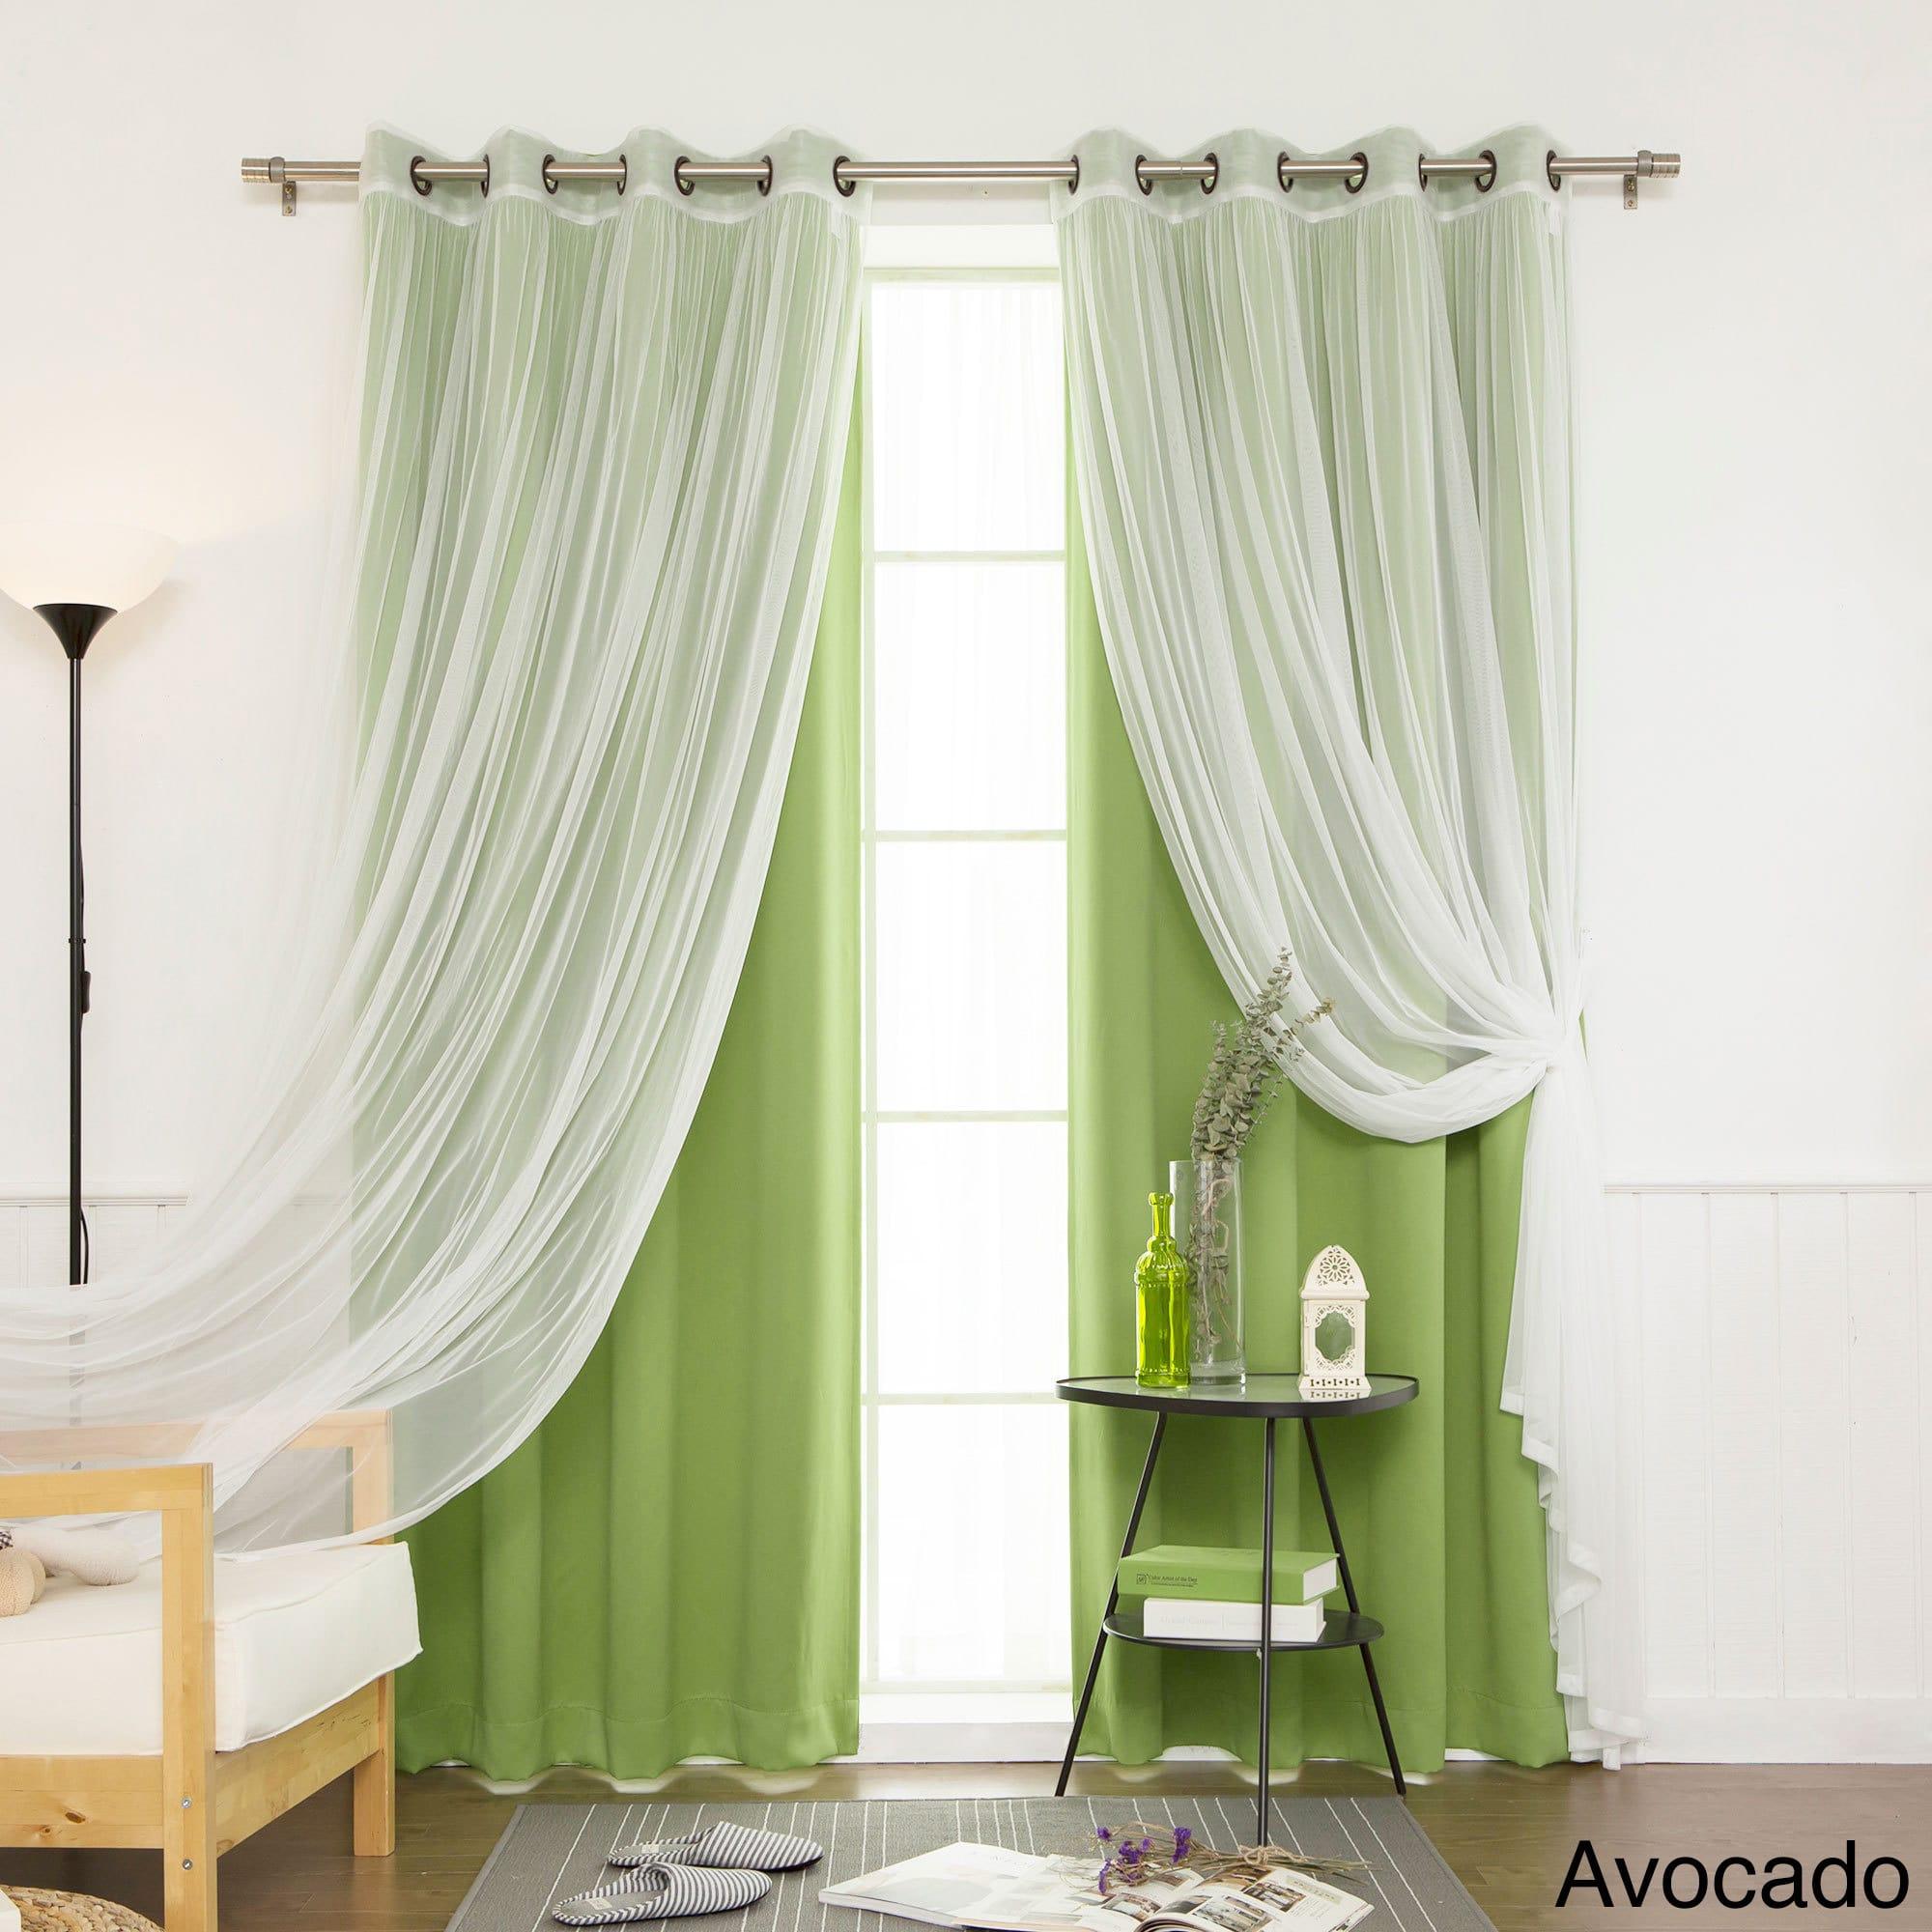 Aurora Home Mix And Match Blackout Blackout Curtains Panel Set (4 Piece) Regarding Mix & Match Blackout Tulle Lace Bronze Grommet Curtain Panel Sets (View 20 of 20)